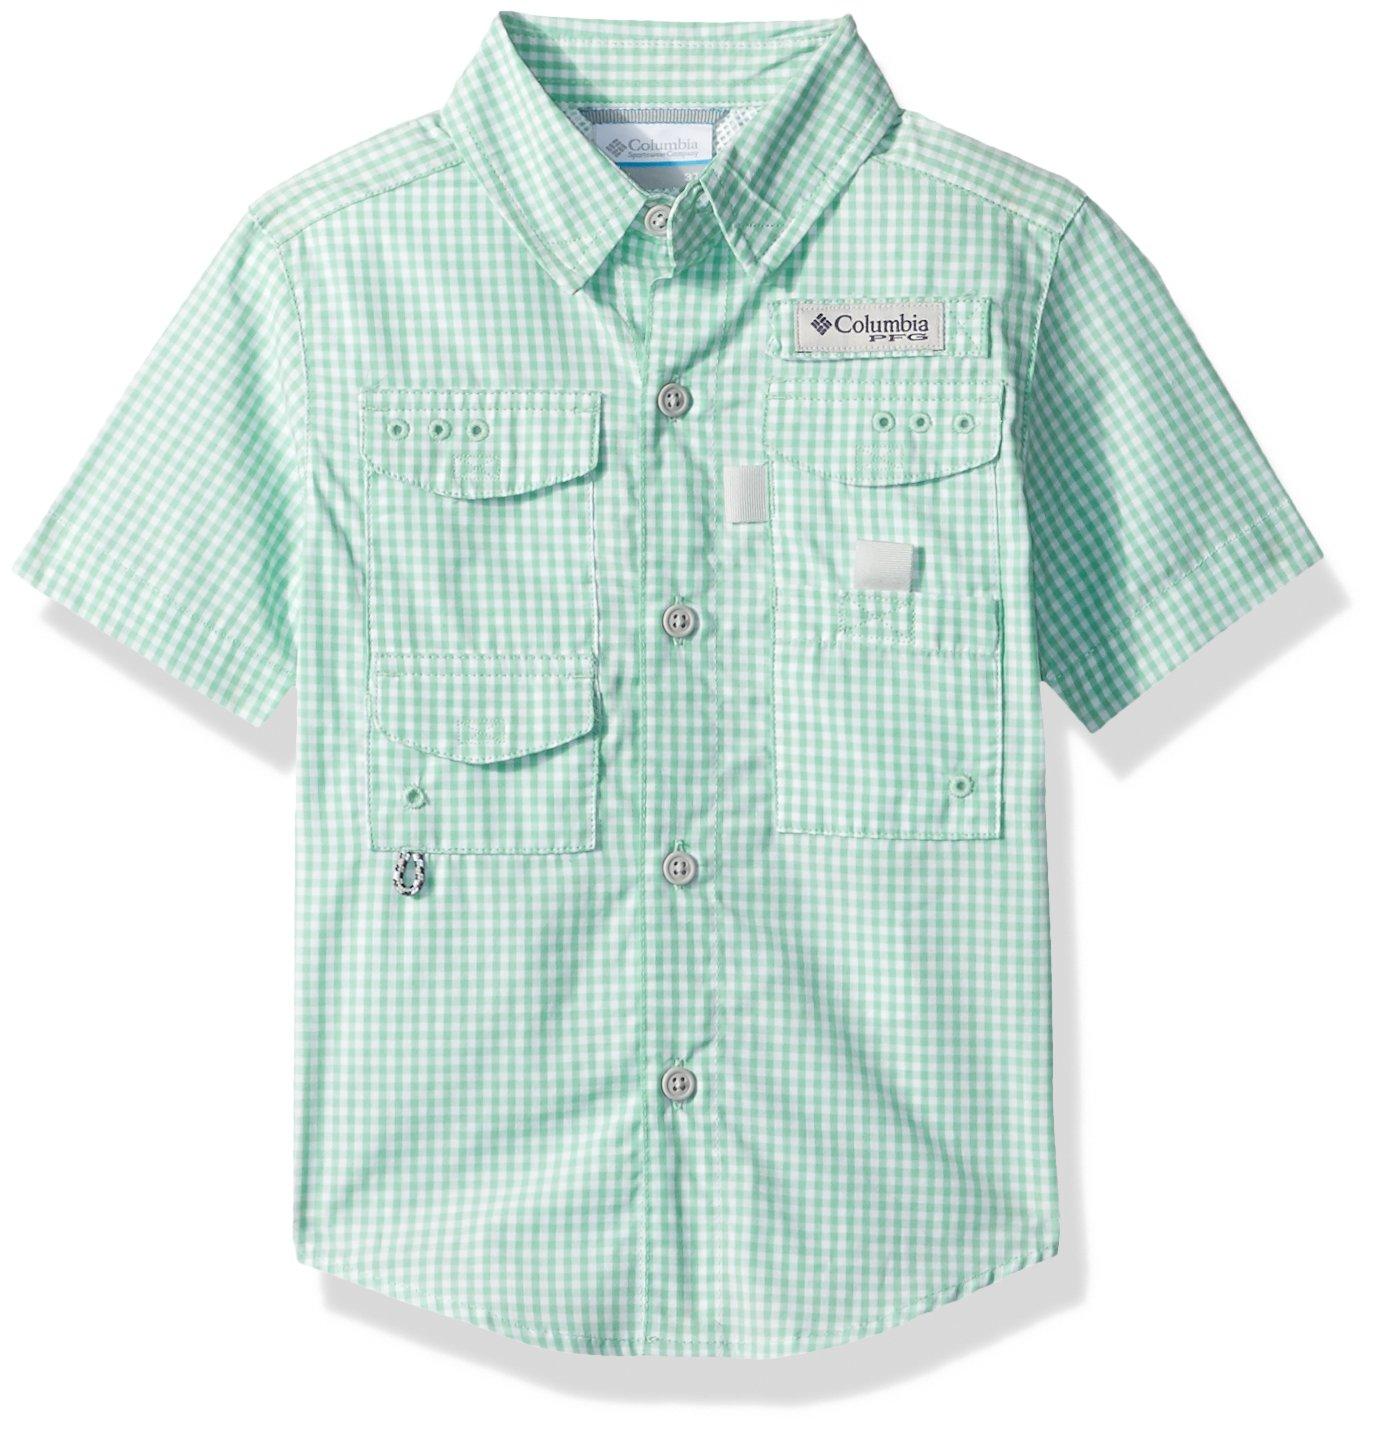 Columbia Youth Boys Super Bonehead Short Sleeve Shirt, Kelp Gingham, Small